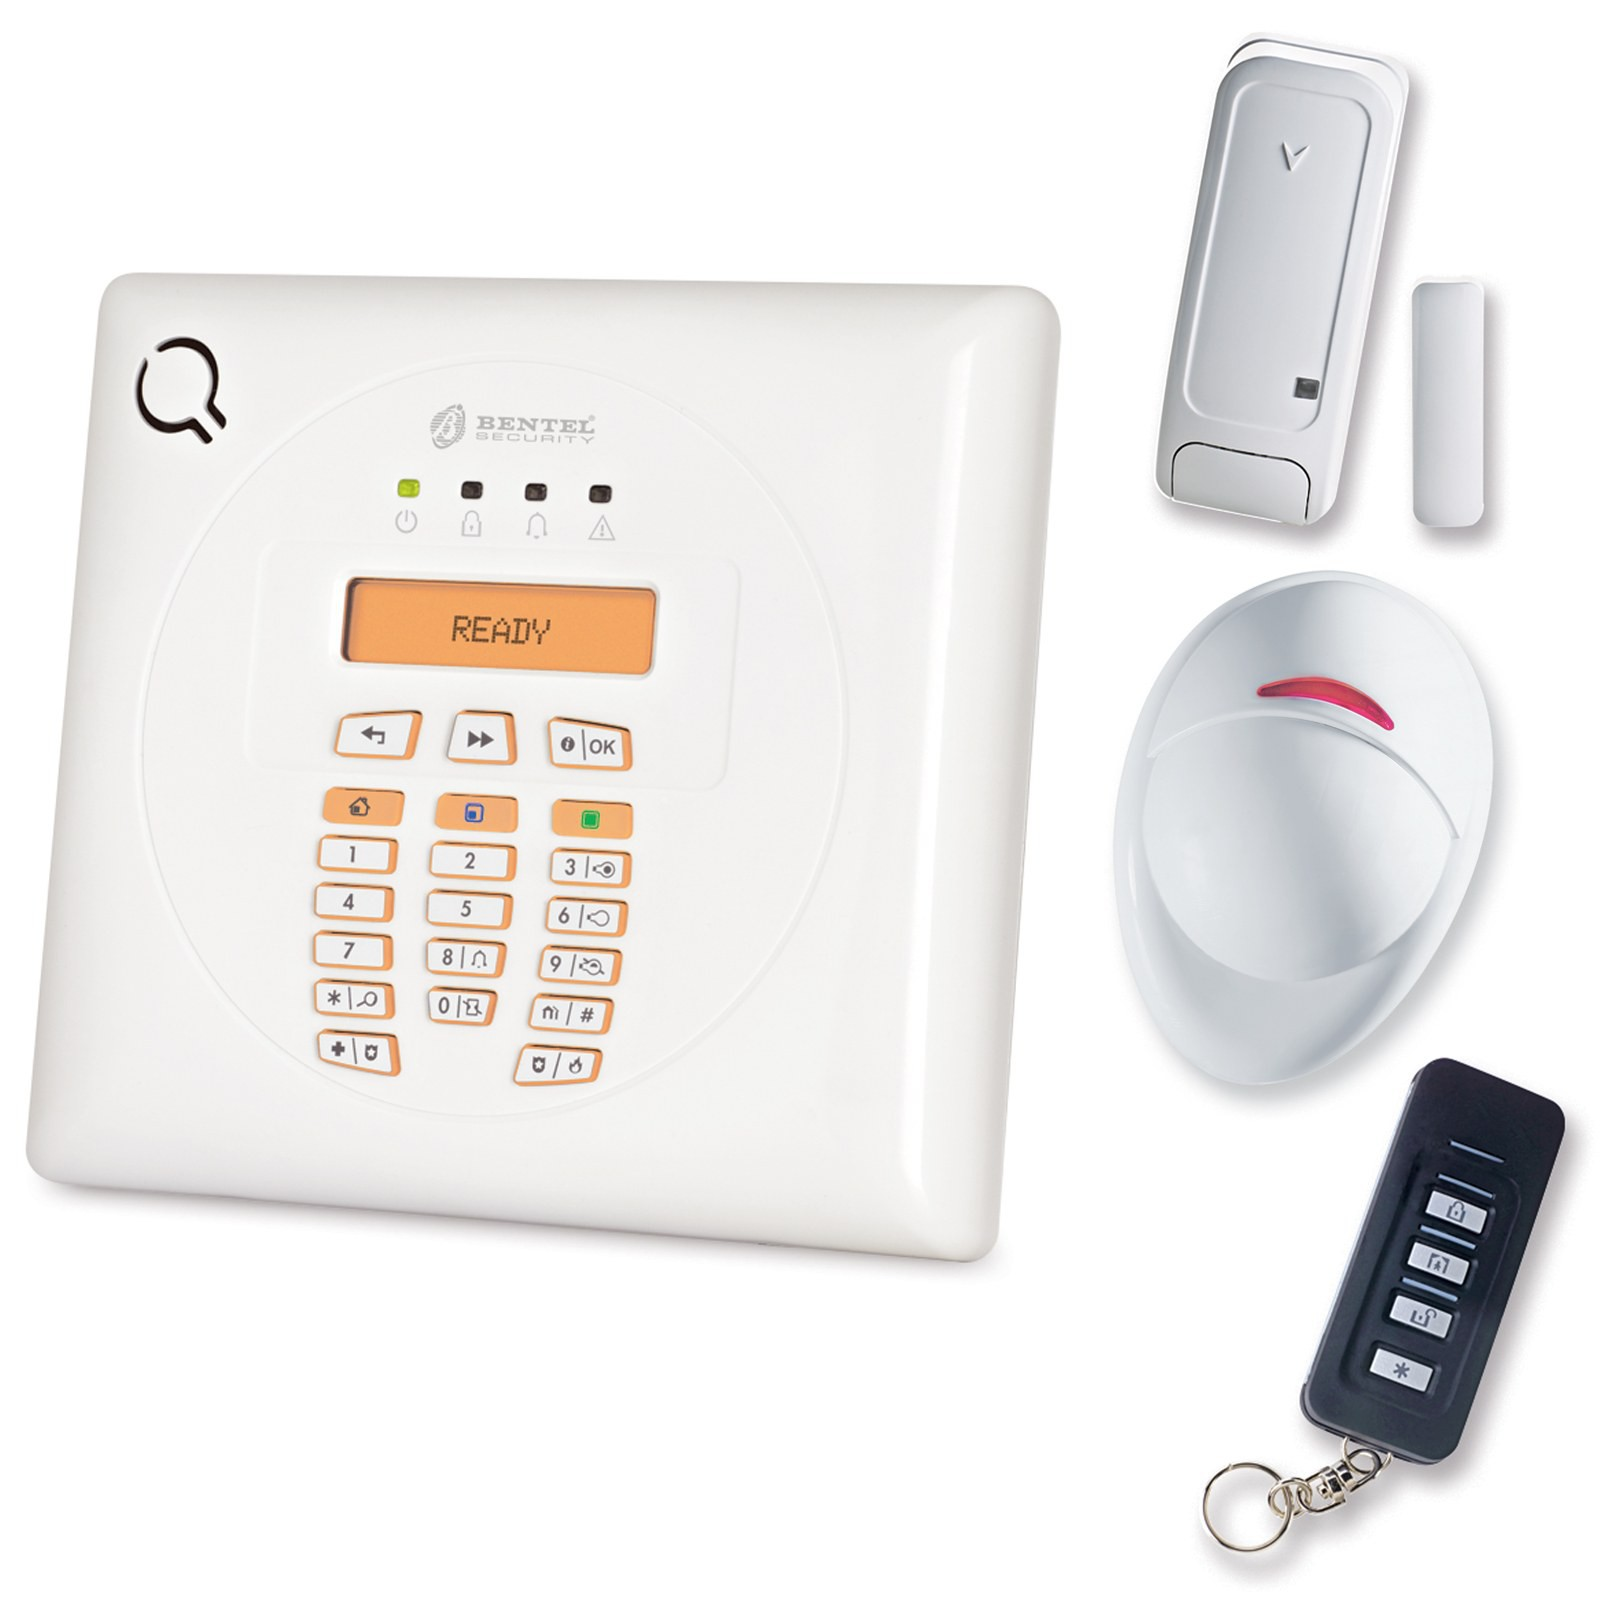 Kit antifurto allarme wireless bentel bw 30 senza fili - Allarmi casa senza fili ...